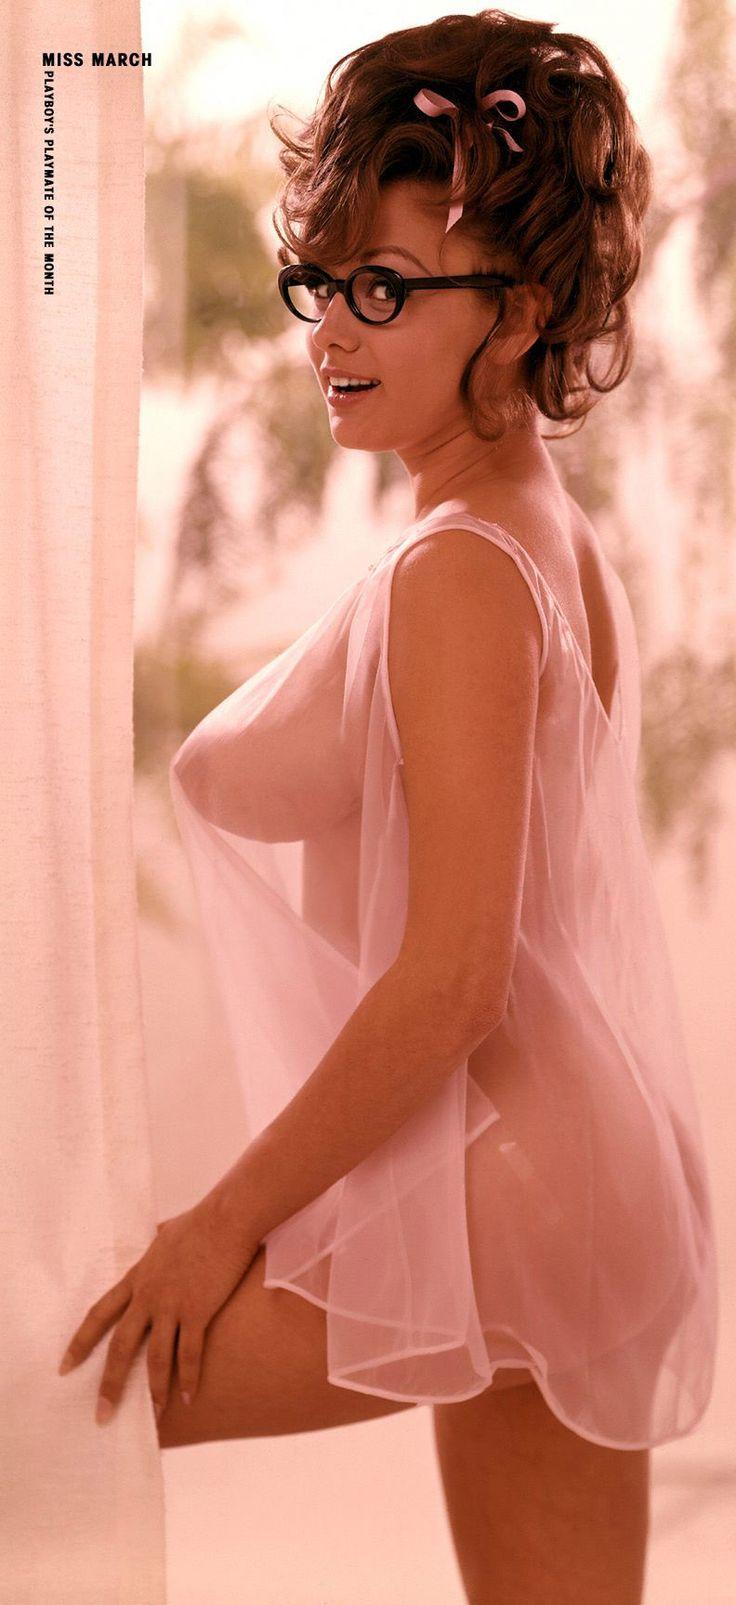 Topless golf video busty